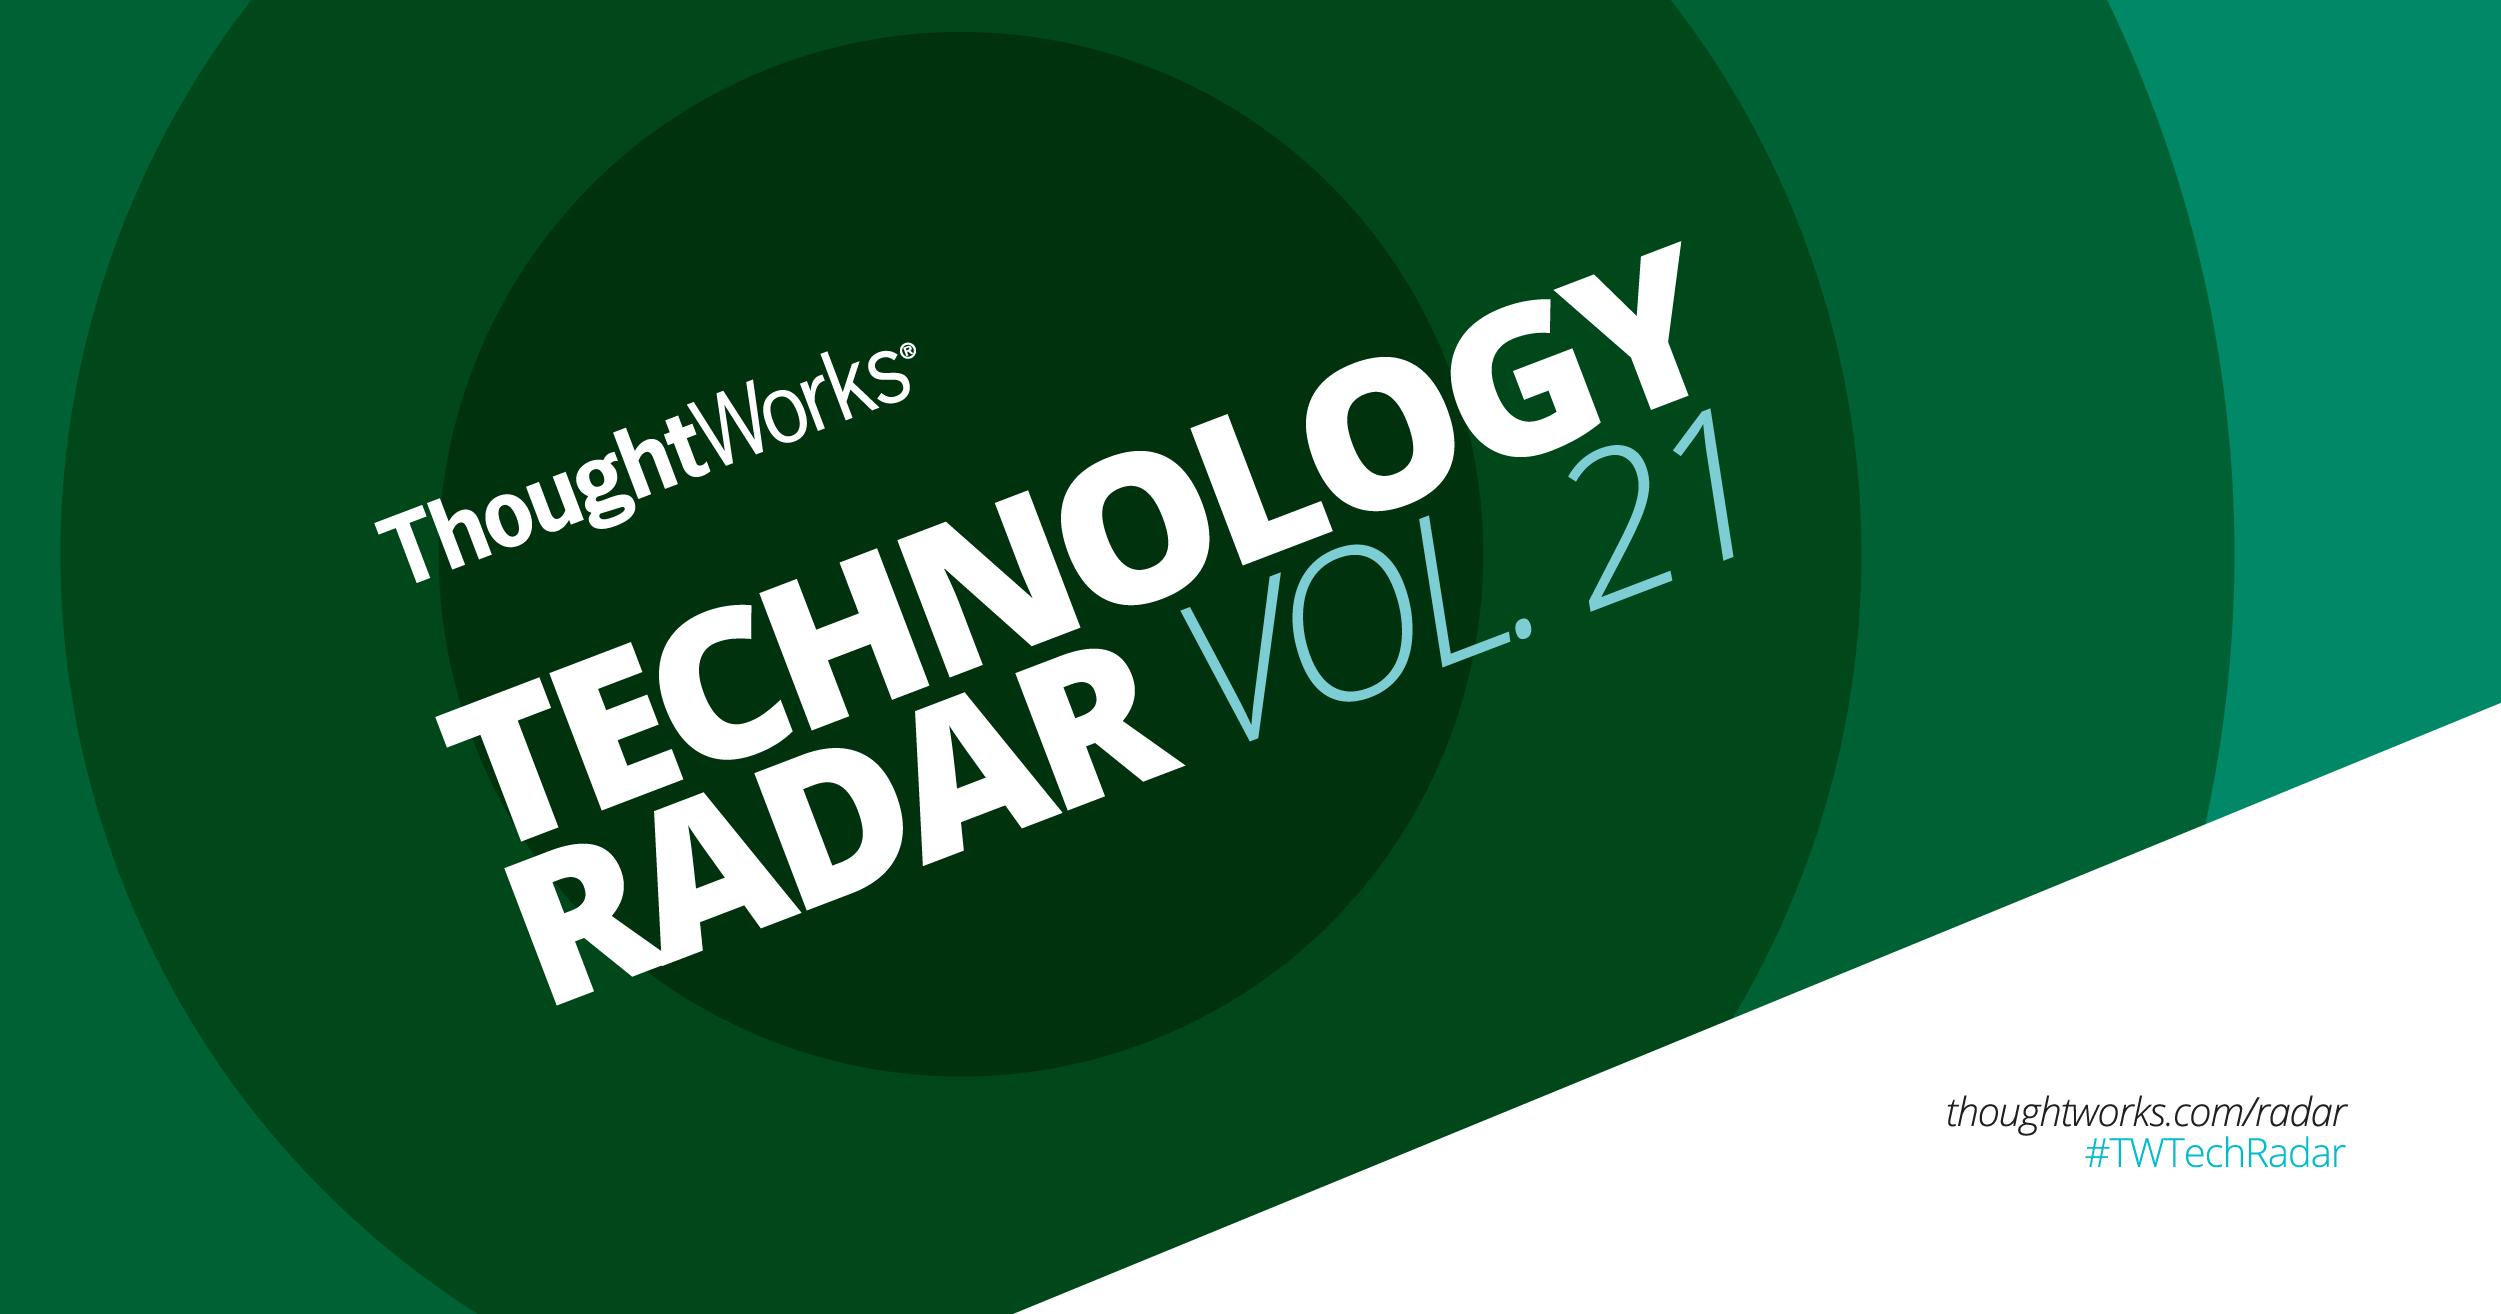 Technology Radar Vol 20